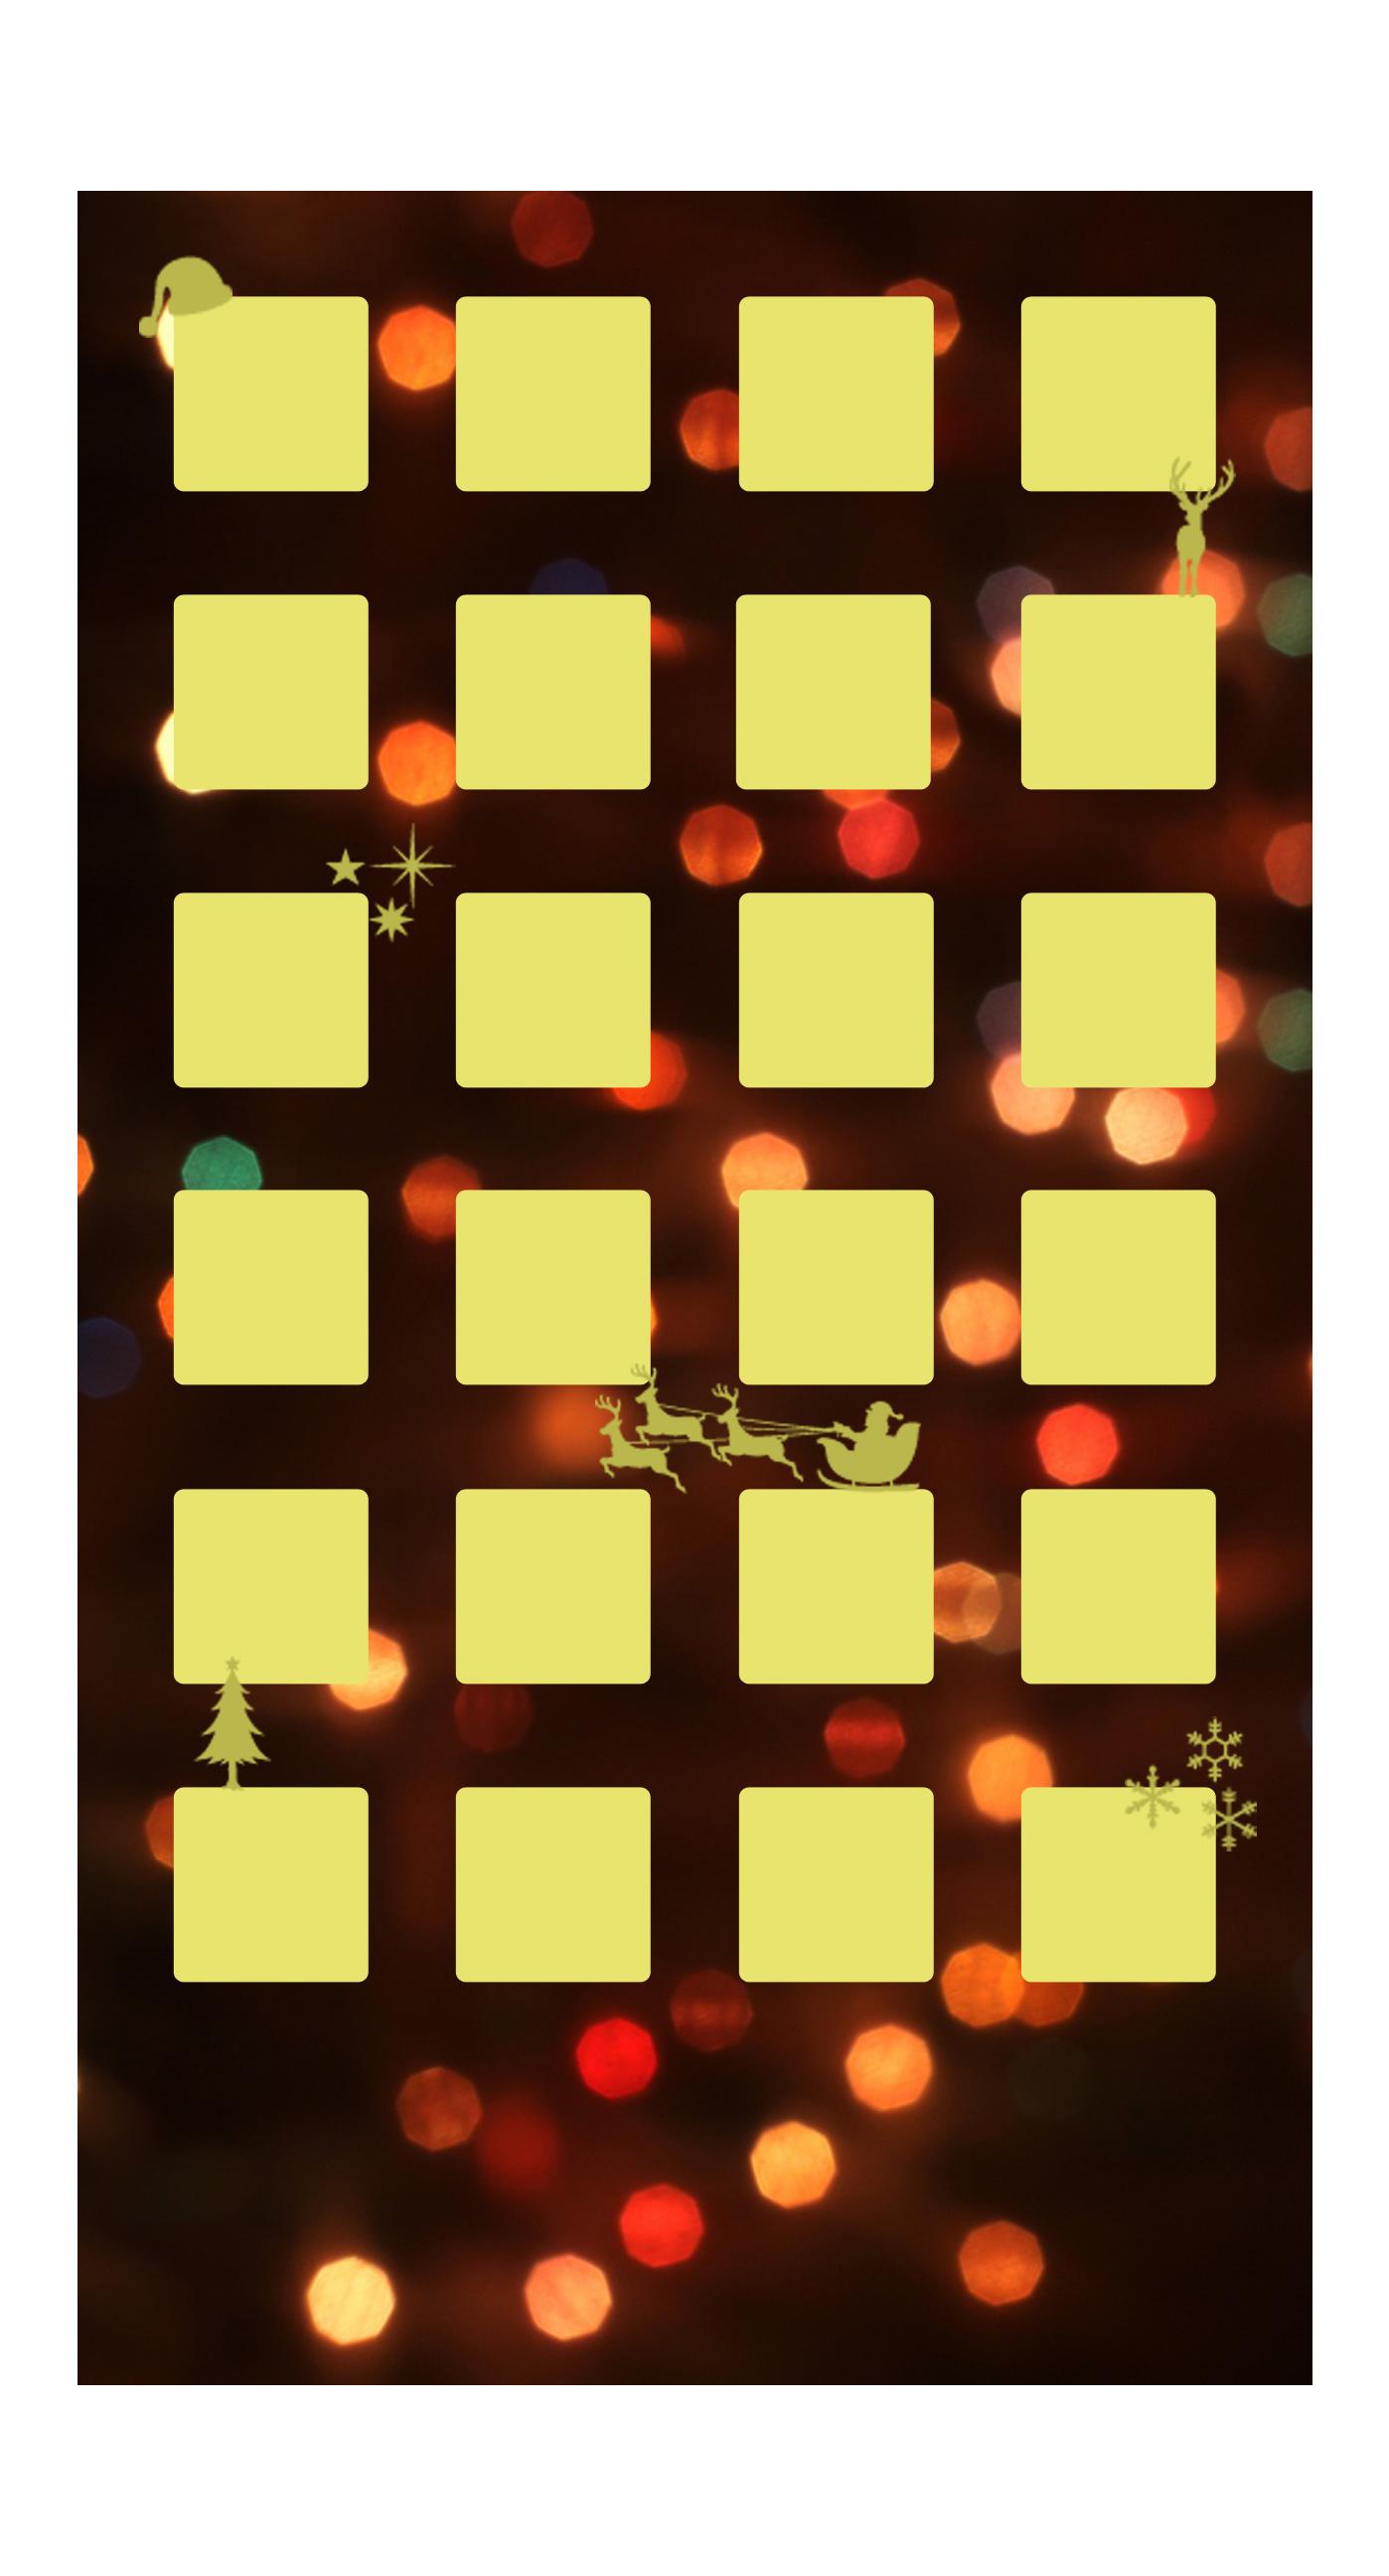 Shelf Christmas yellow light women wallpapersc iPhone7Plus 1398x2592